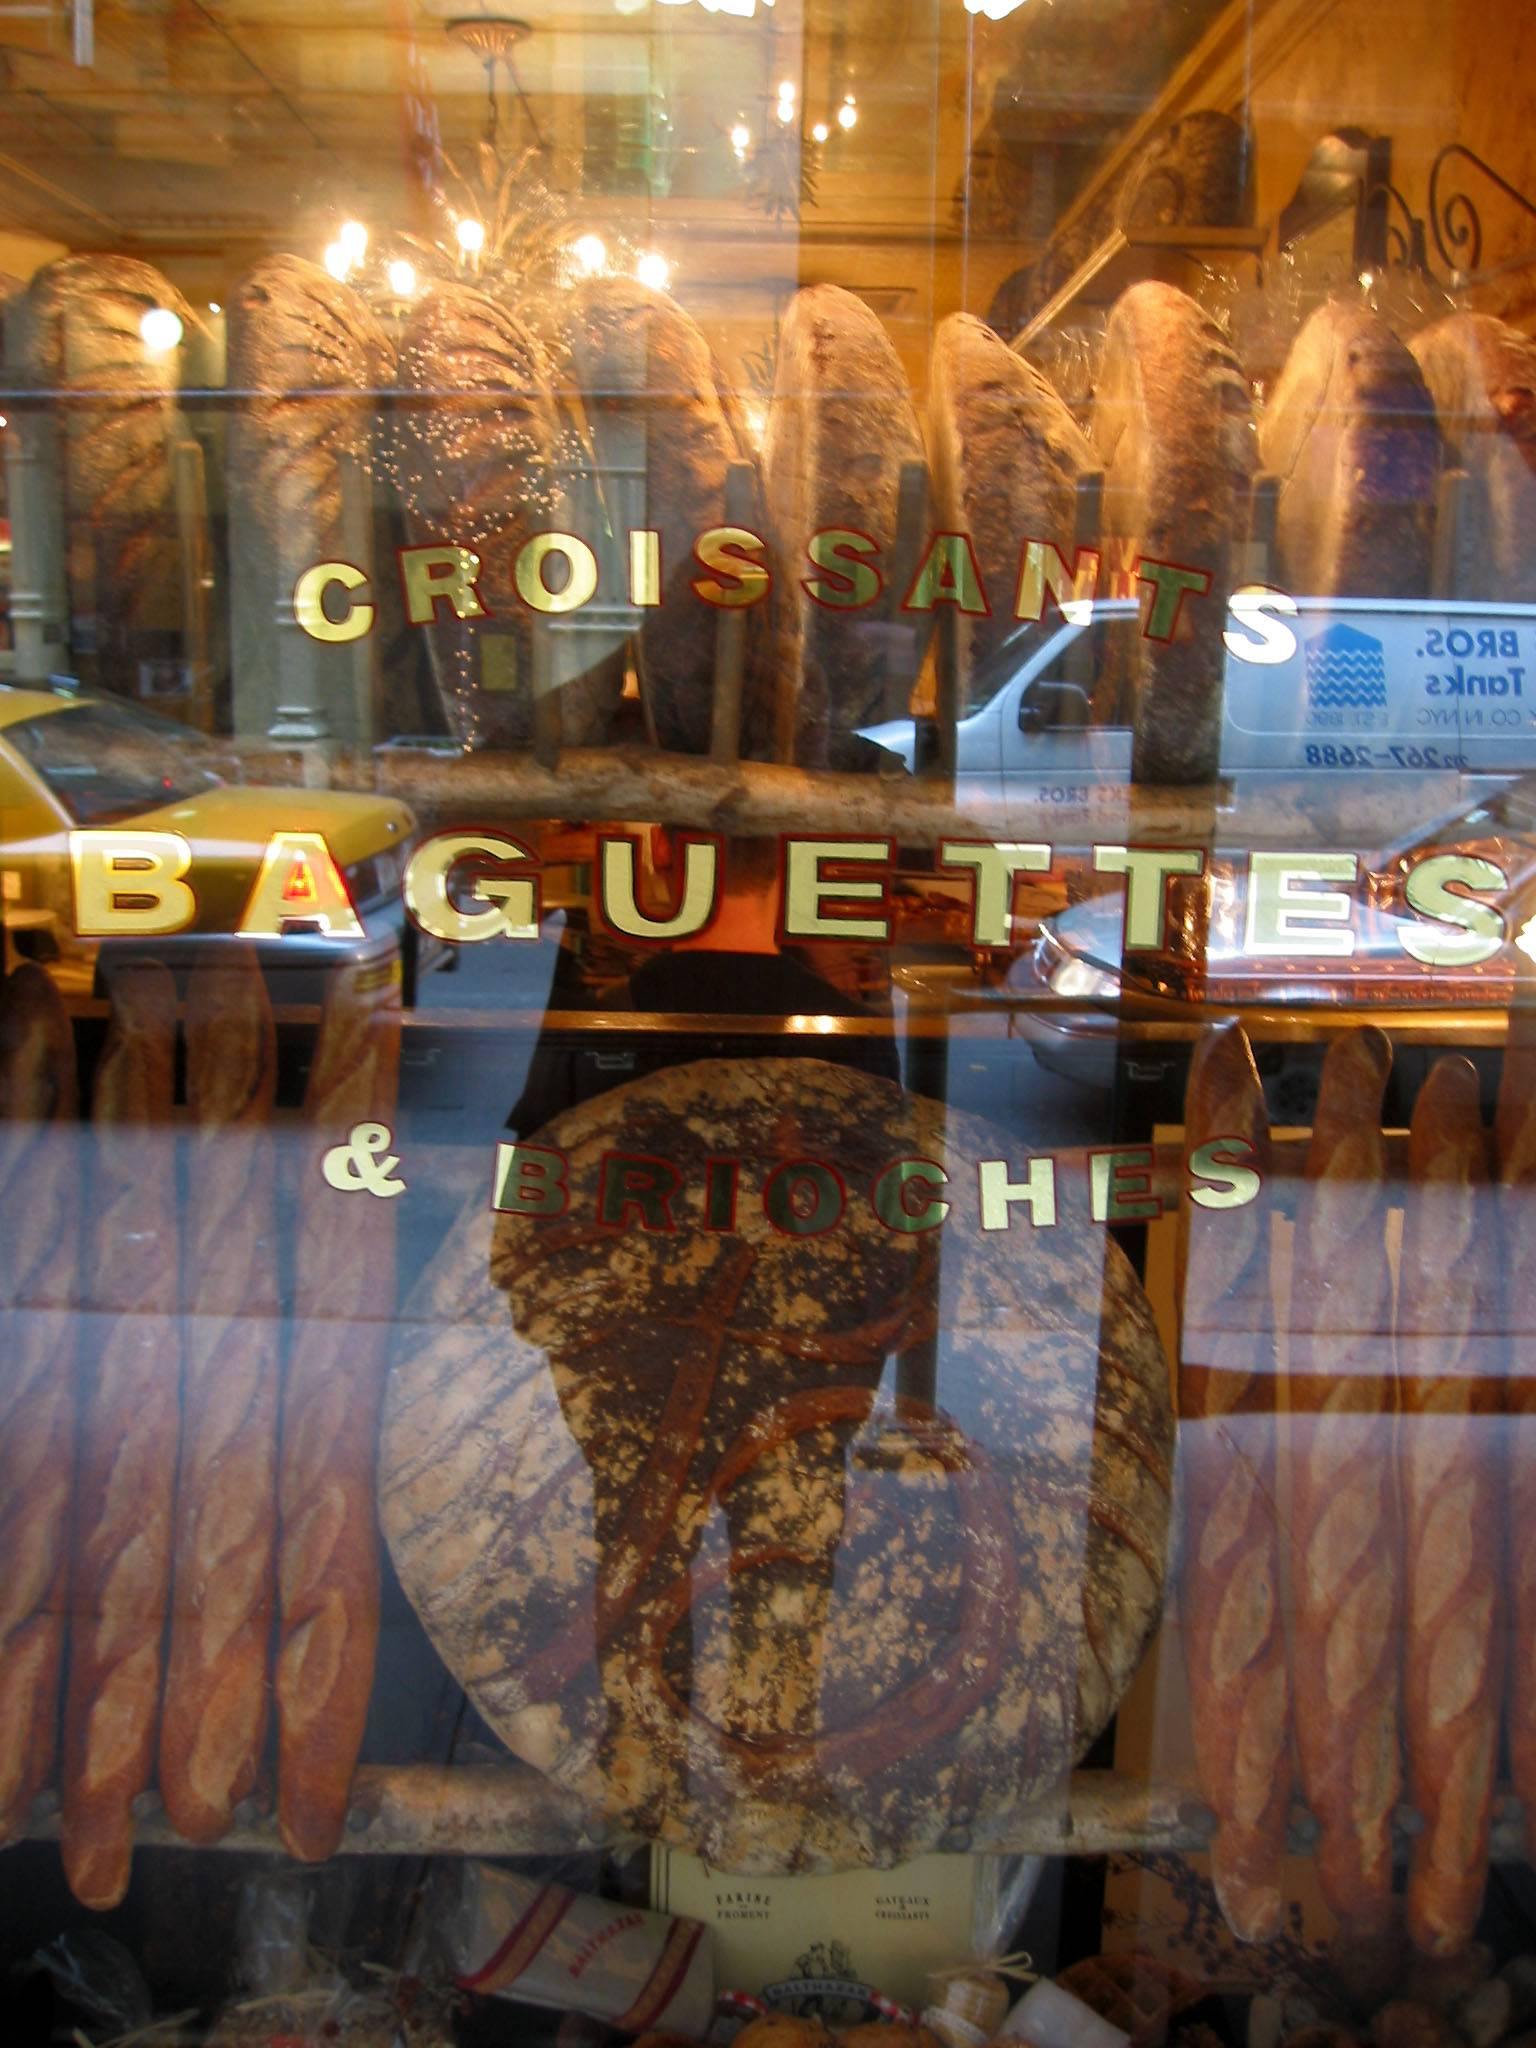 Balthazars Bakery  between Broadway & Crosby